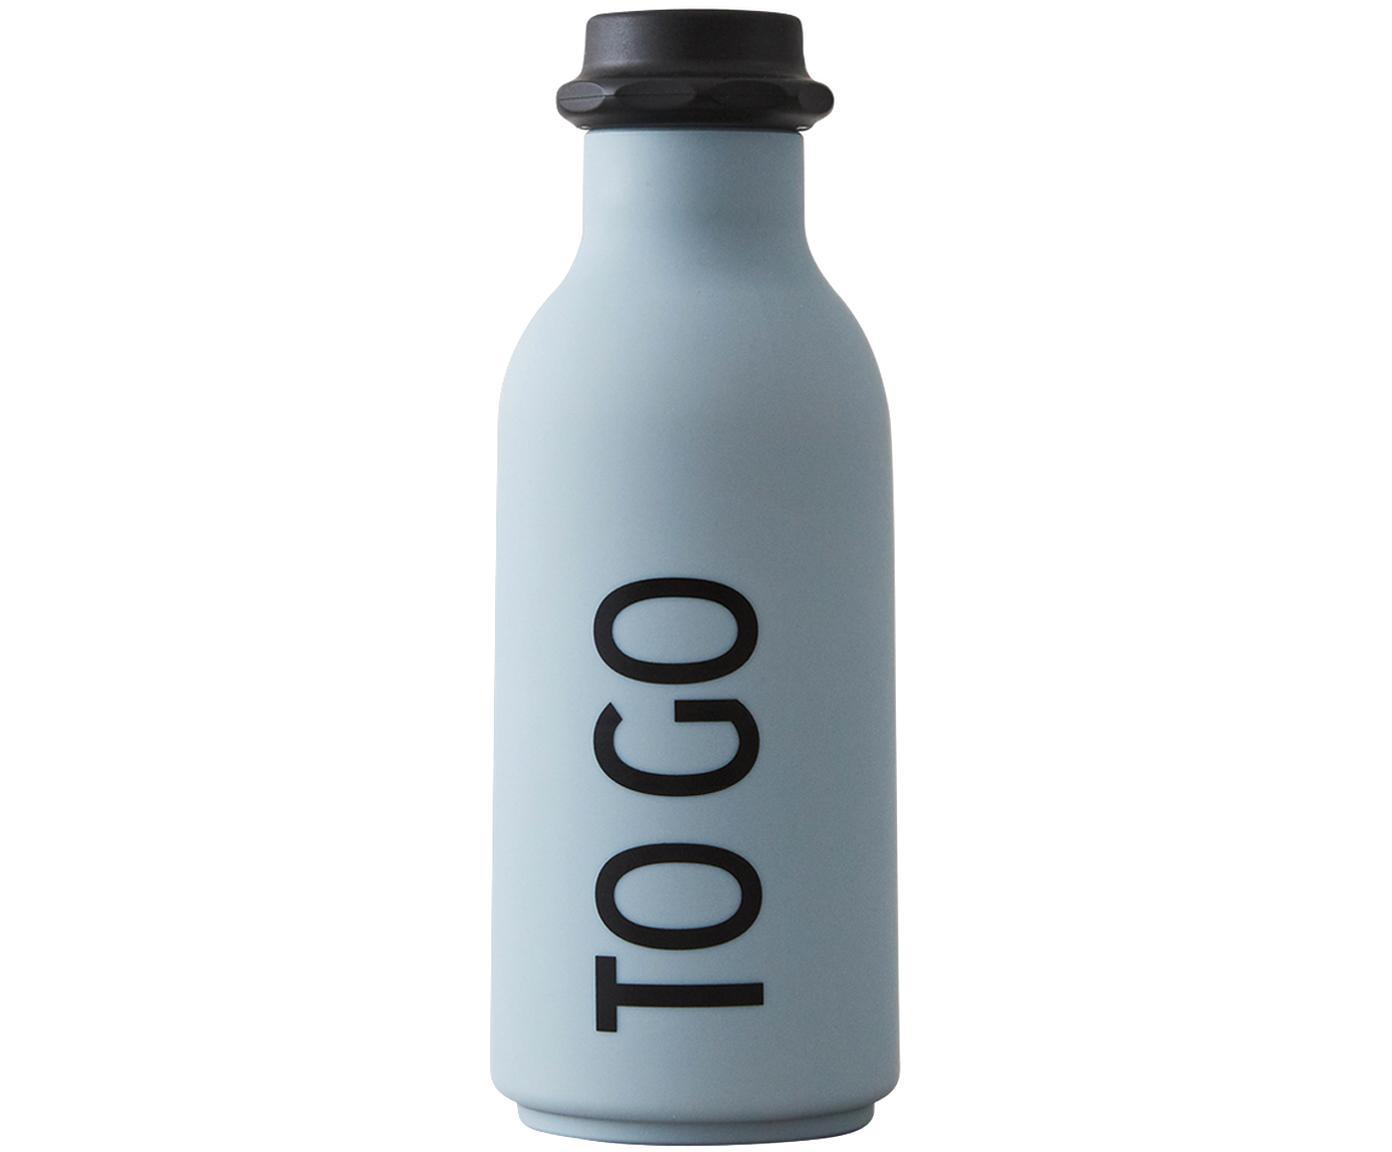 Botella To Go, Botella: Tritan (plástico), libre , Azul claro, negro, Ø 8 x Al 20 cm